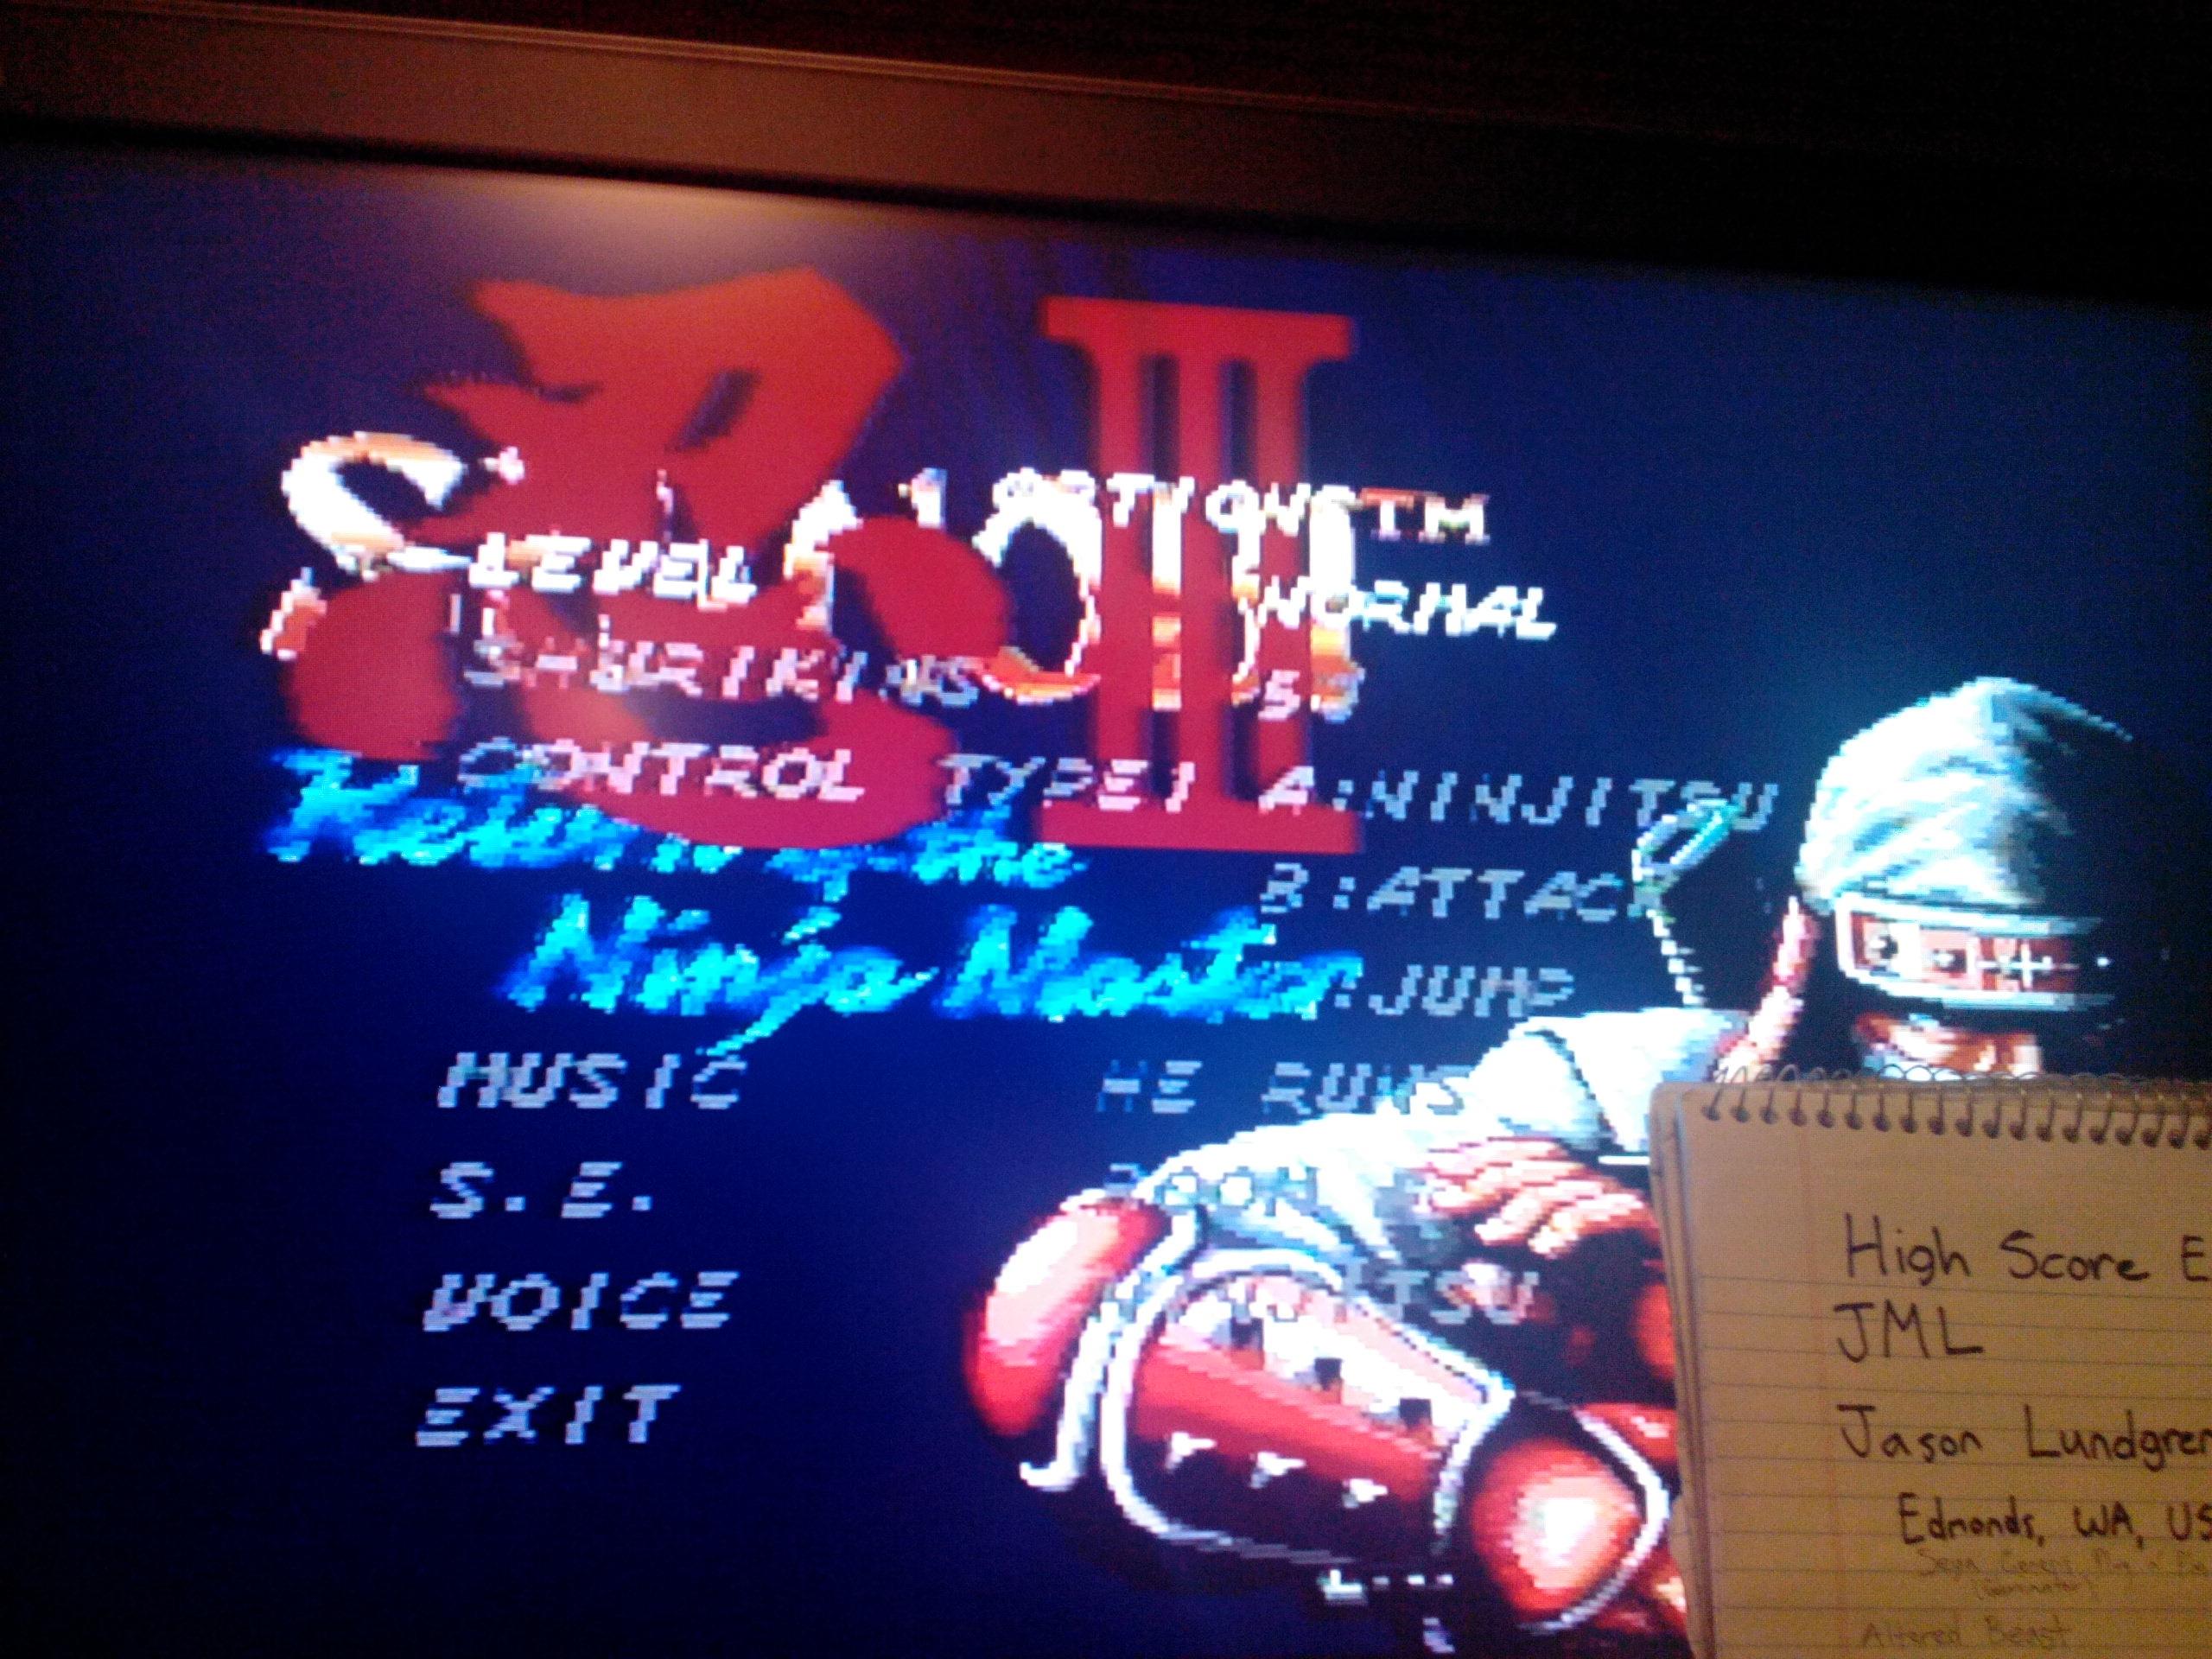 Shinobi III: Return of the Ninja Master 13,070 points